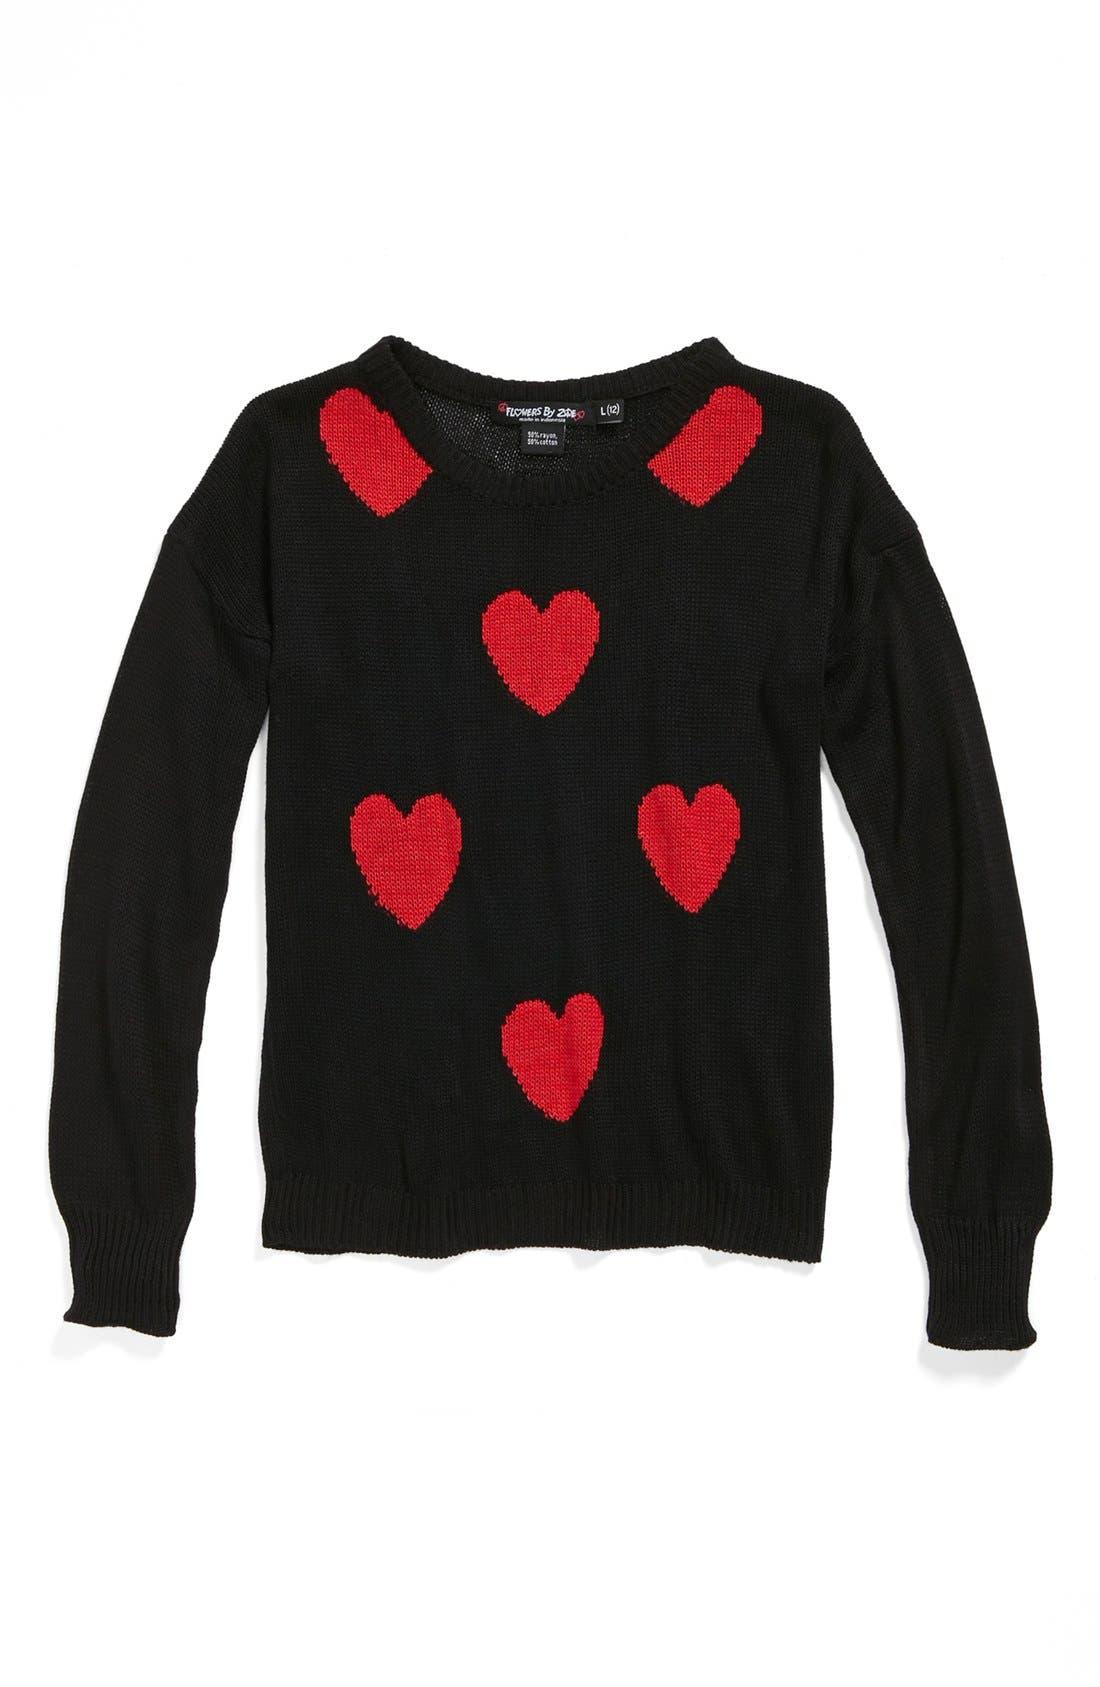 Main Image - Flowers by Zoe 'Hearts' Knit Sweater (Big Girls)